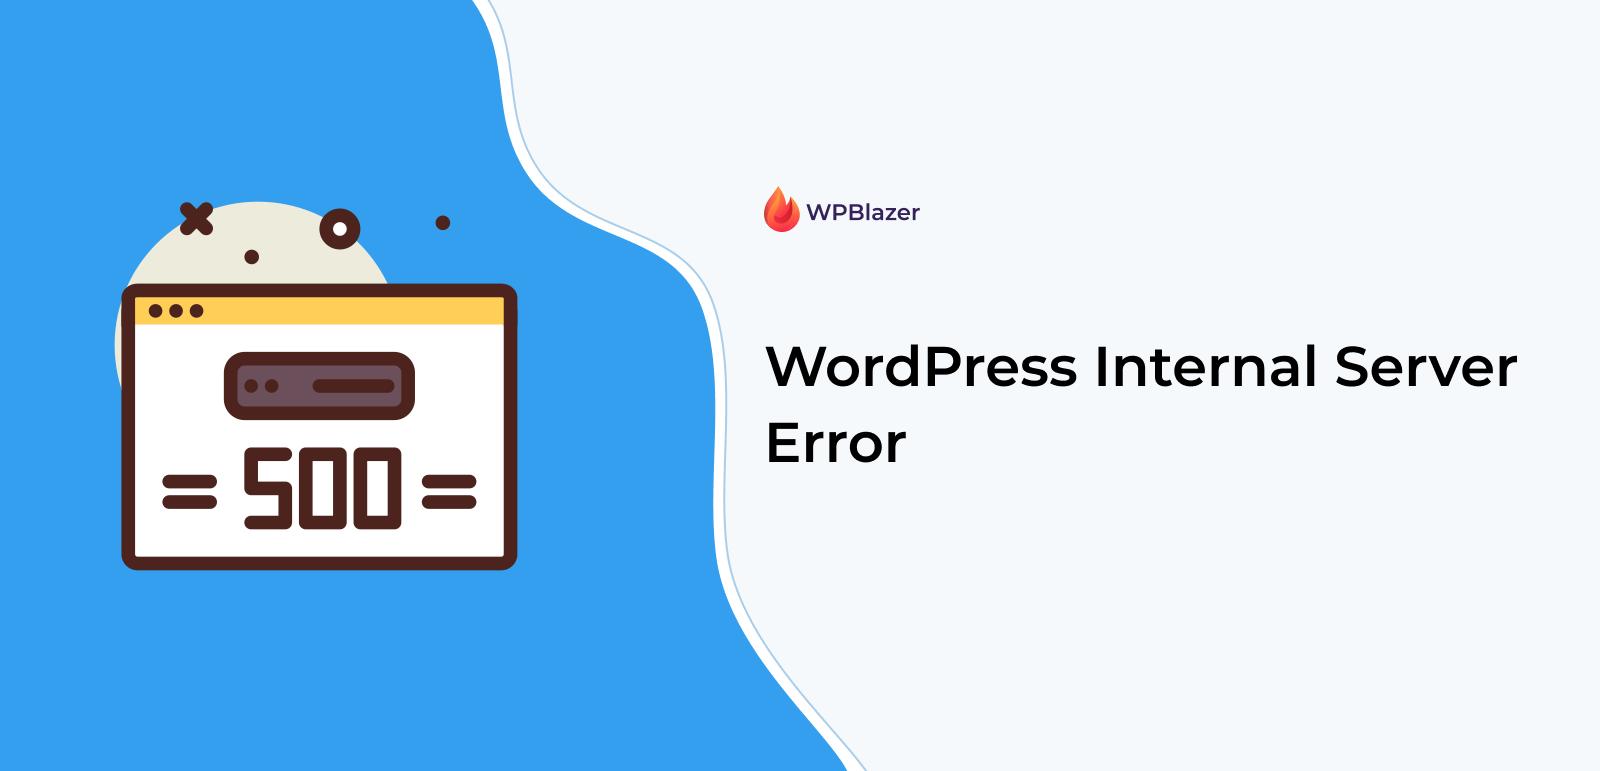 How to Fix the WordPress Internal Server Error (Detailed Steps)